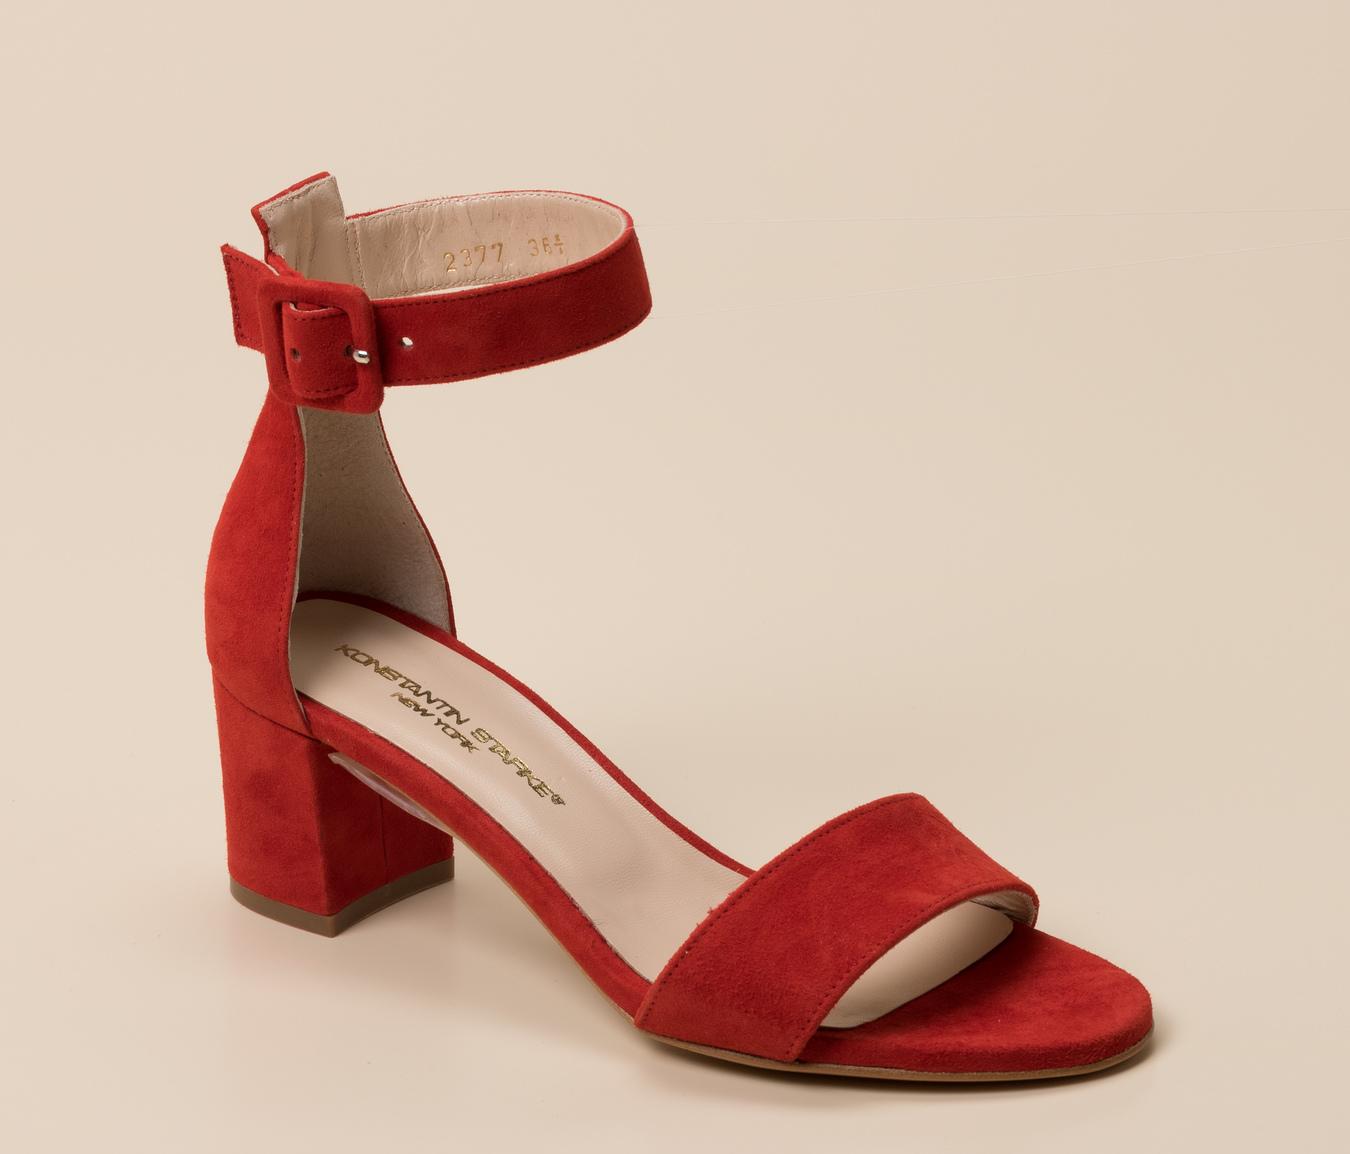 quality design 7a481 6ec3b Sandalette